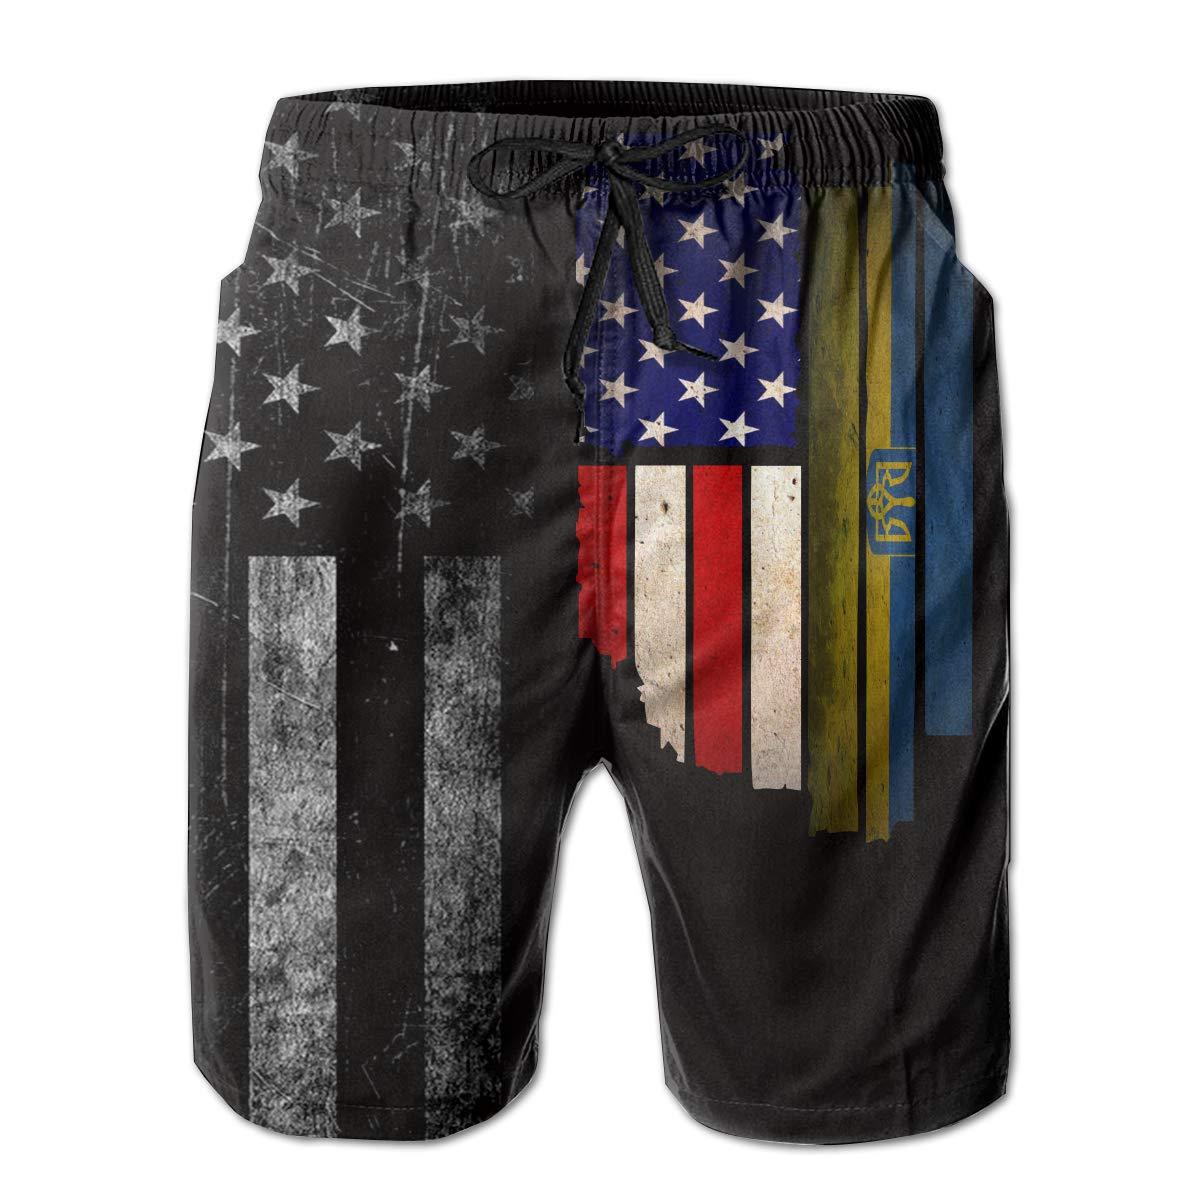 Mens Vintage USA Ukraine Flag Board Shorts Beach Pants